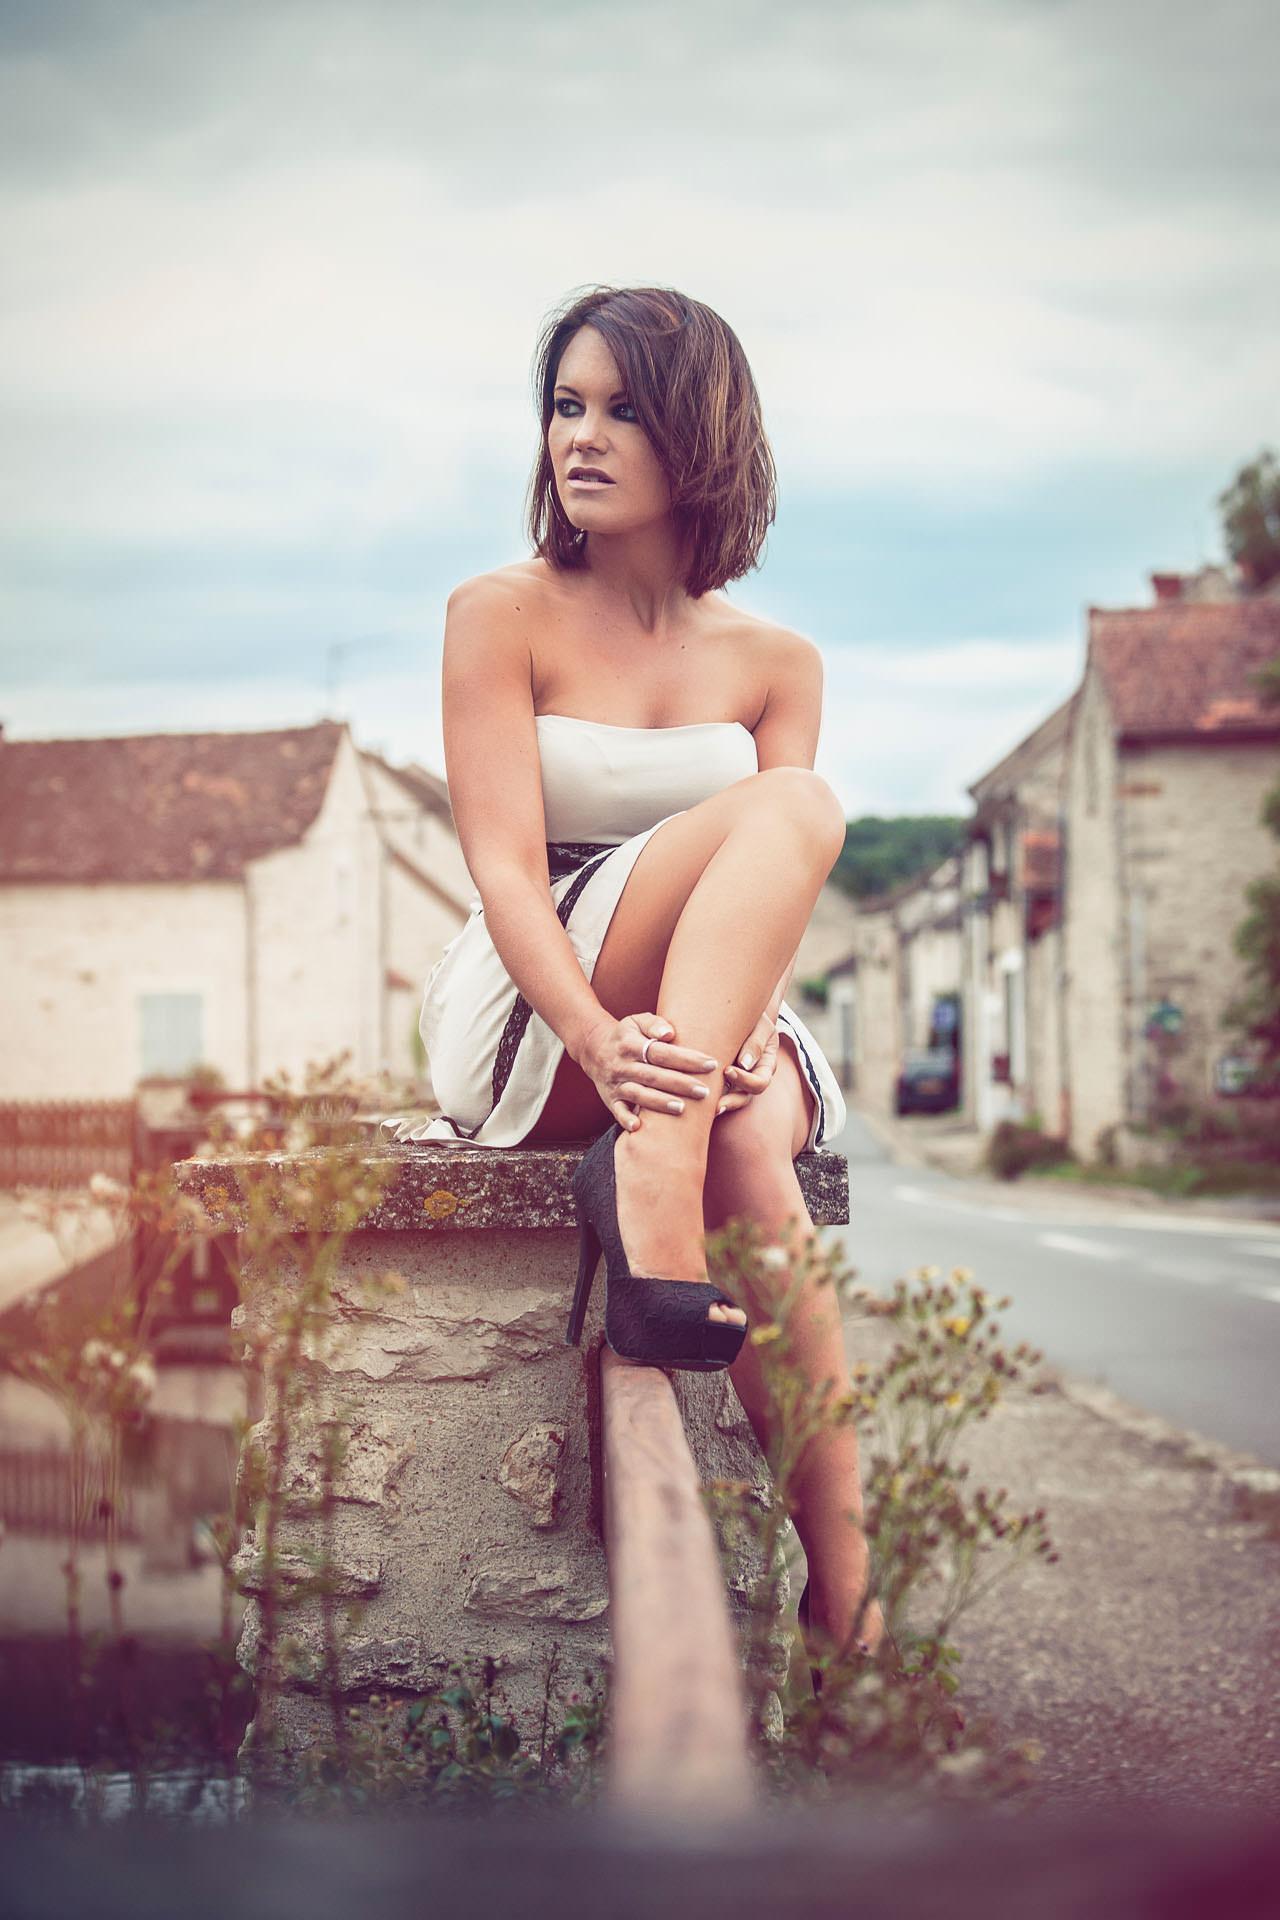 2014-08-19 - Chérie - Dannemois - 9762 - 1920px